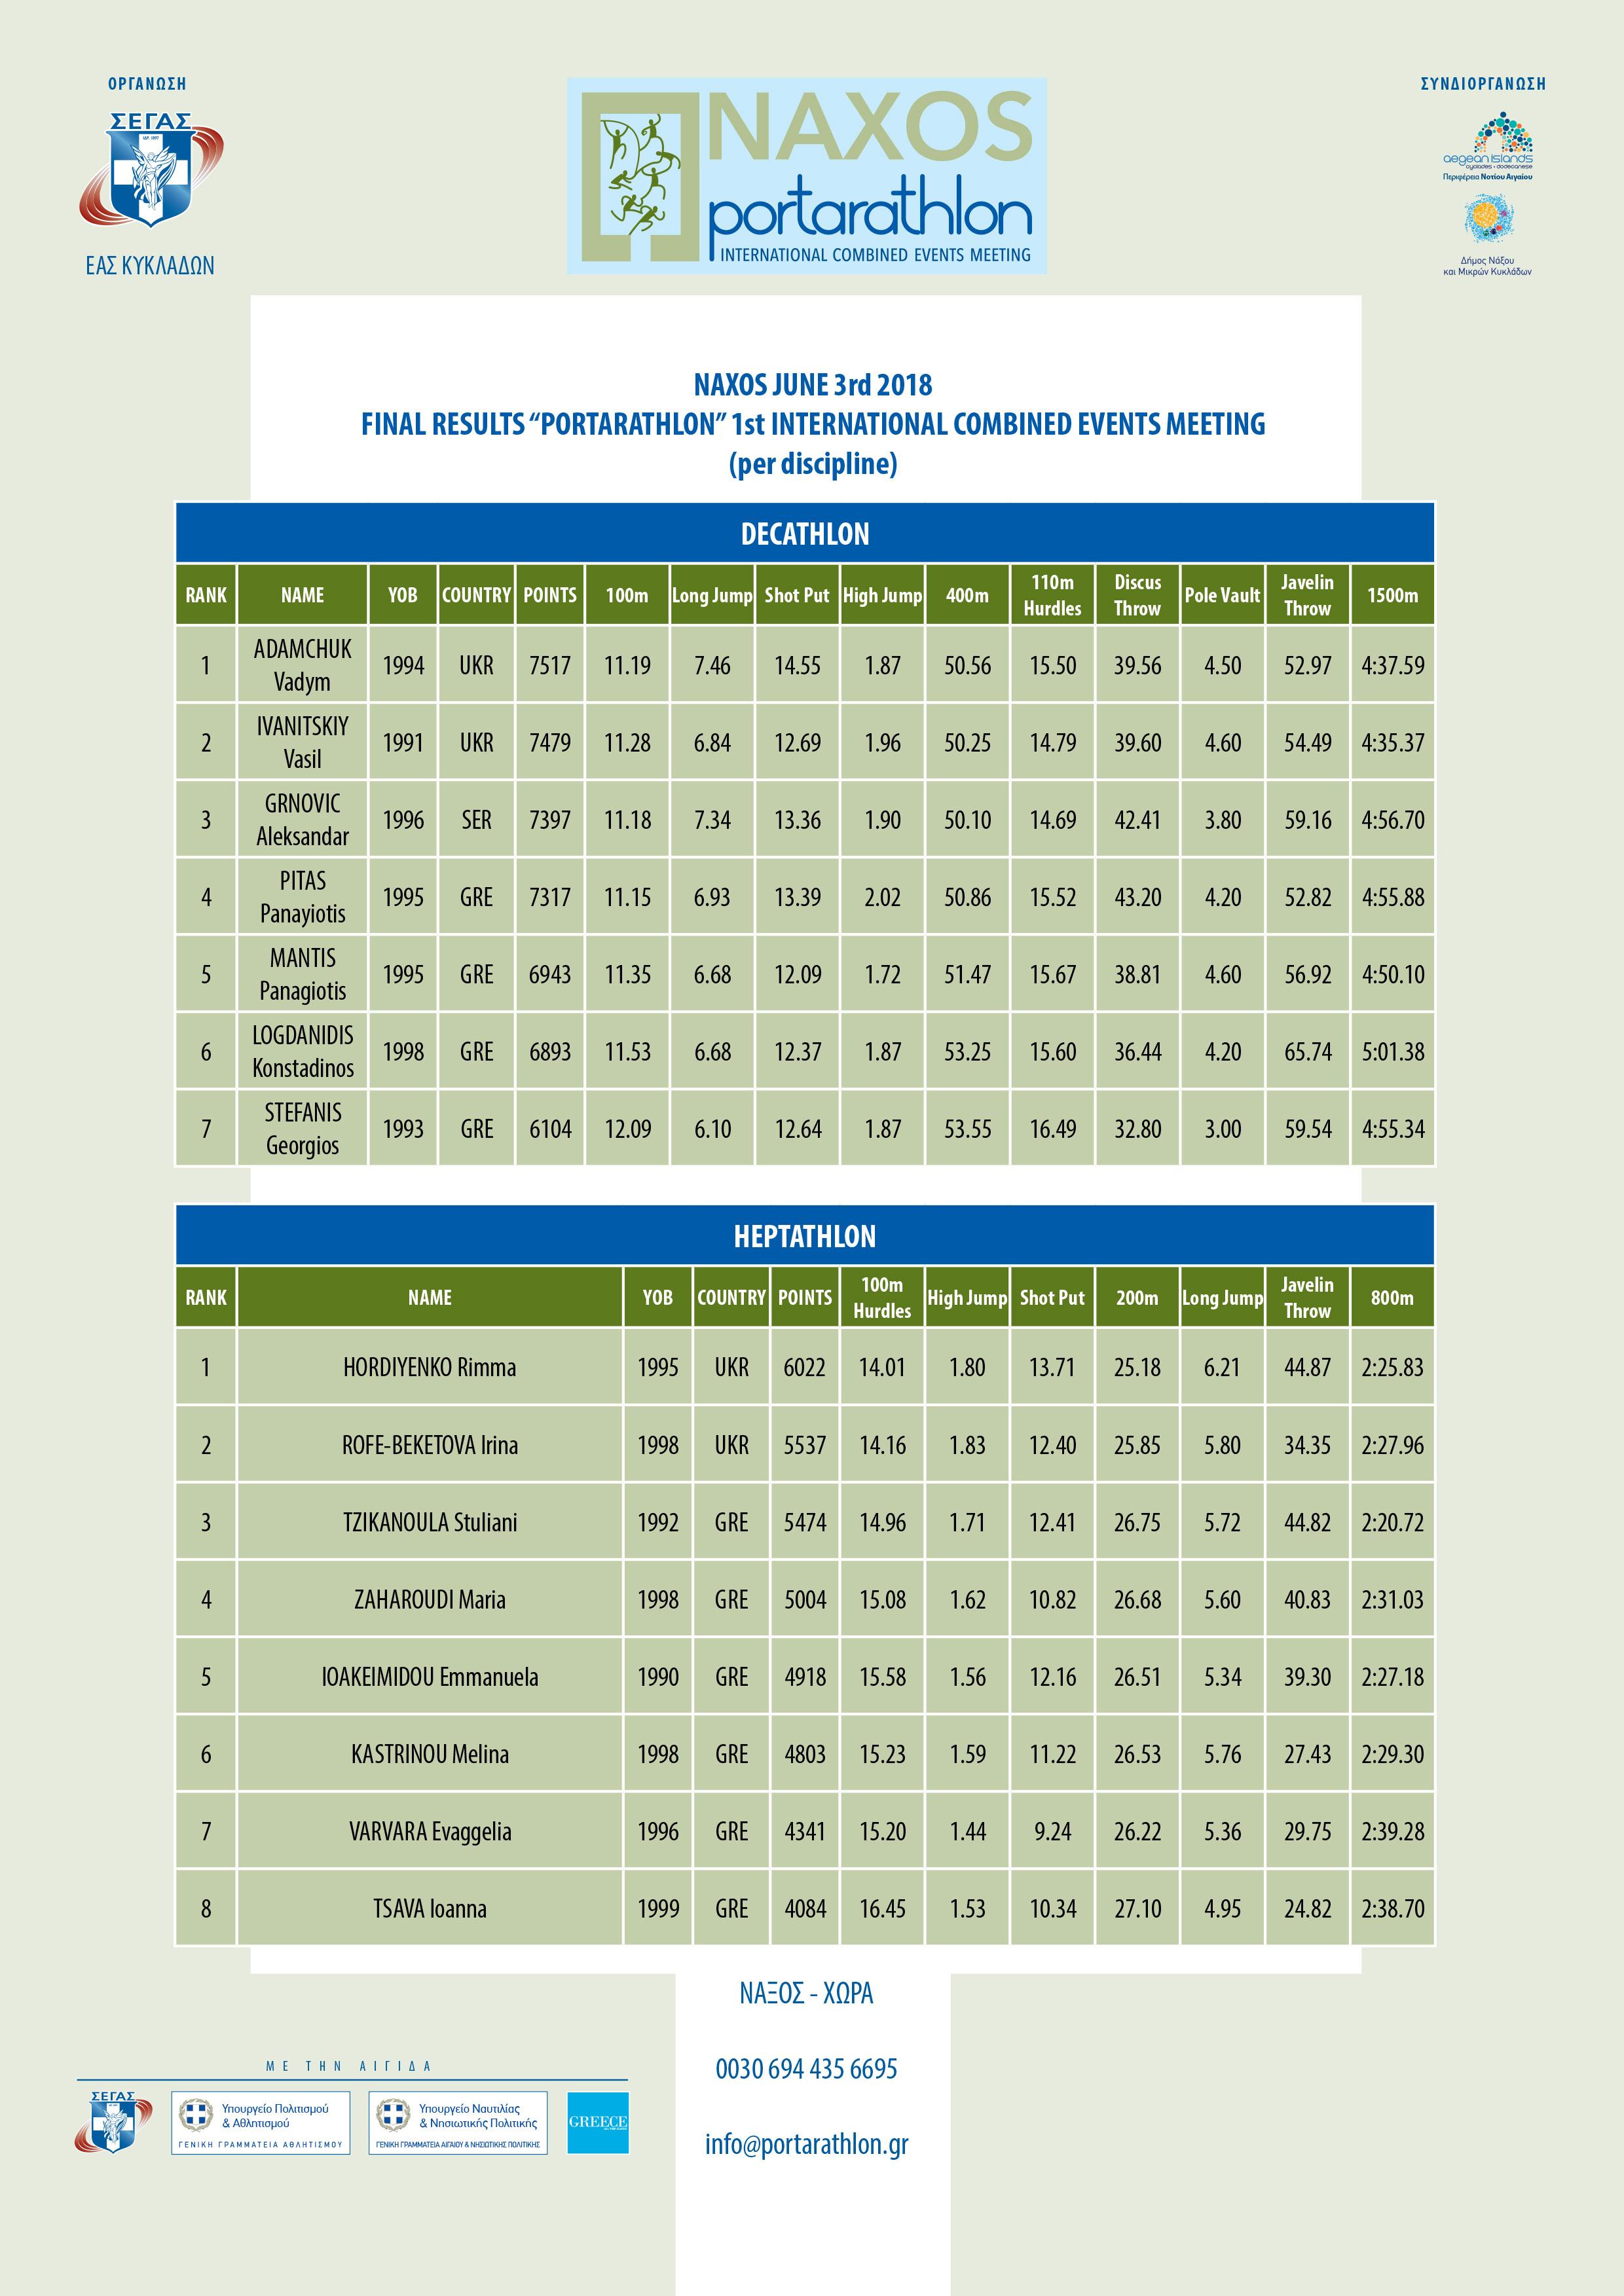 portarathlon results per discipline